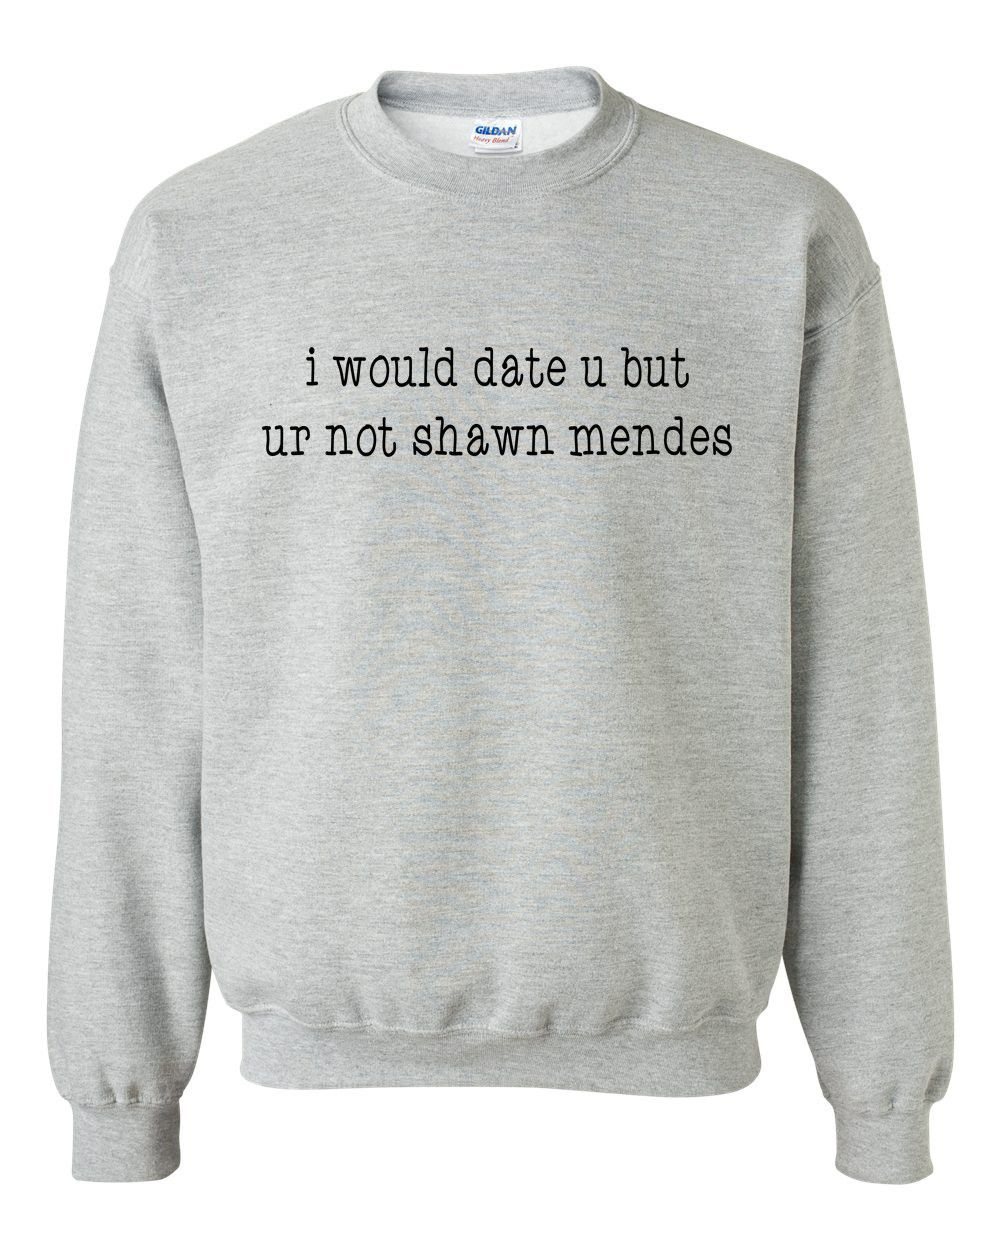 1f02f8fed8562f I would date u but ur not shawn mendes Crewneck Sweatshirt